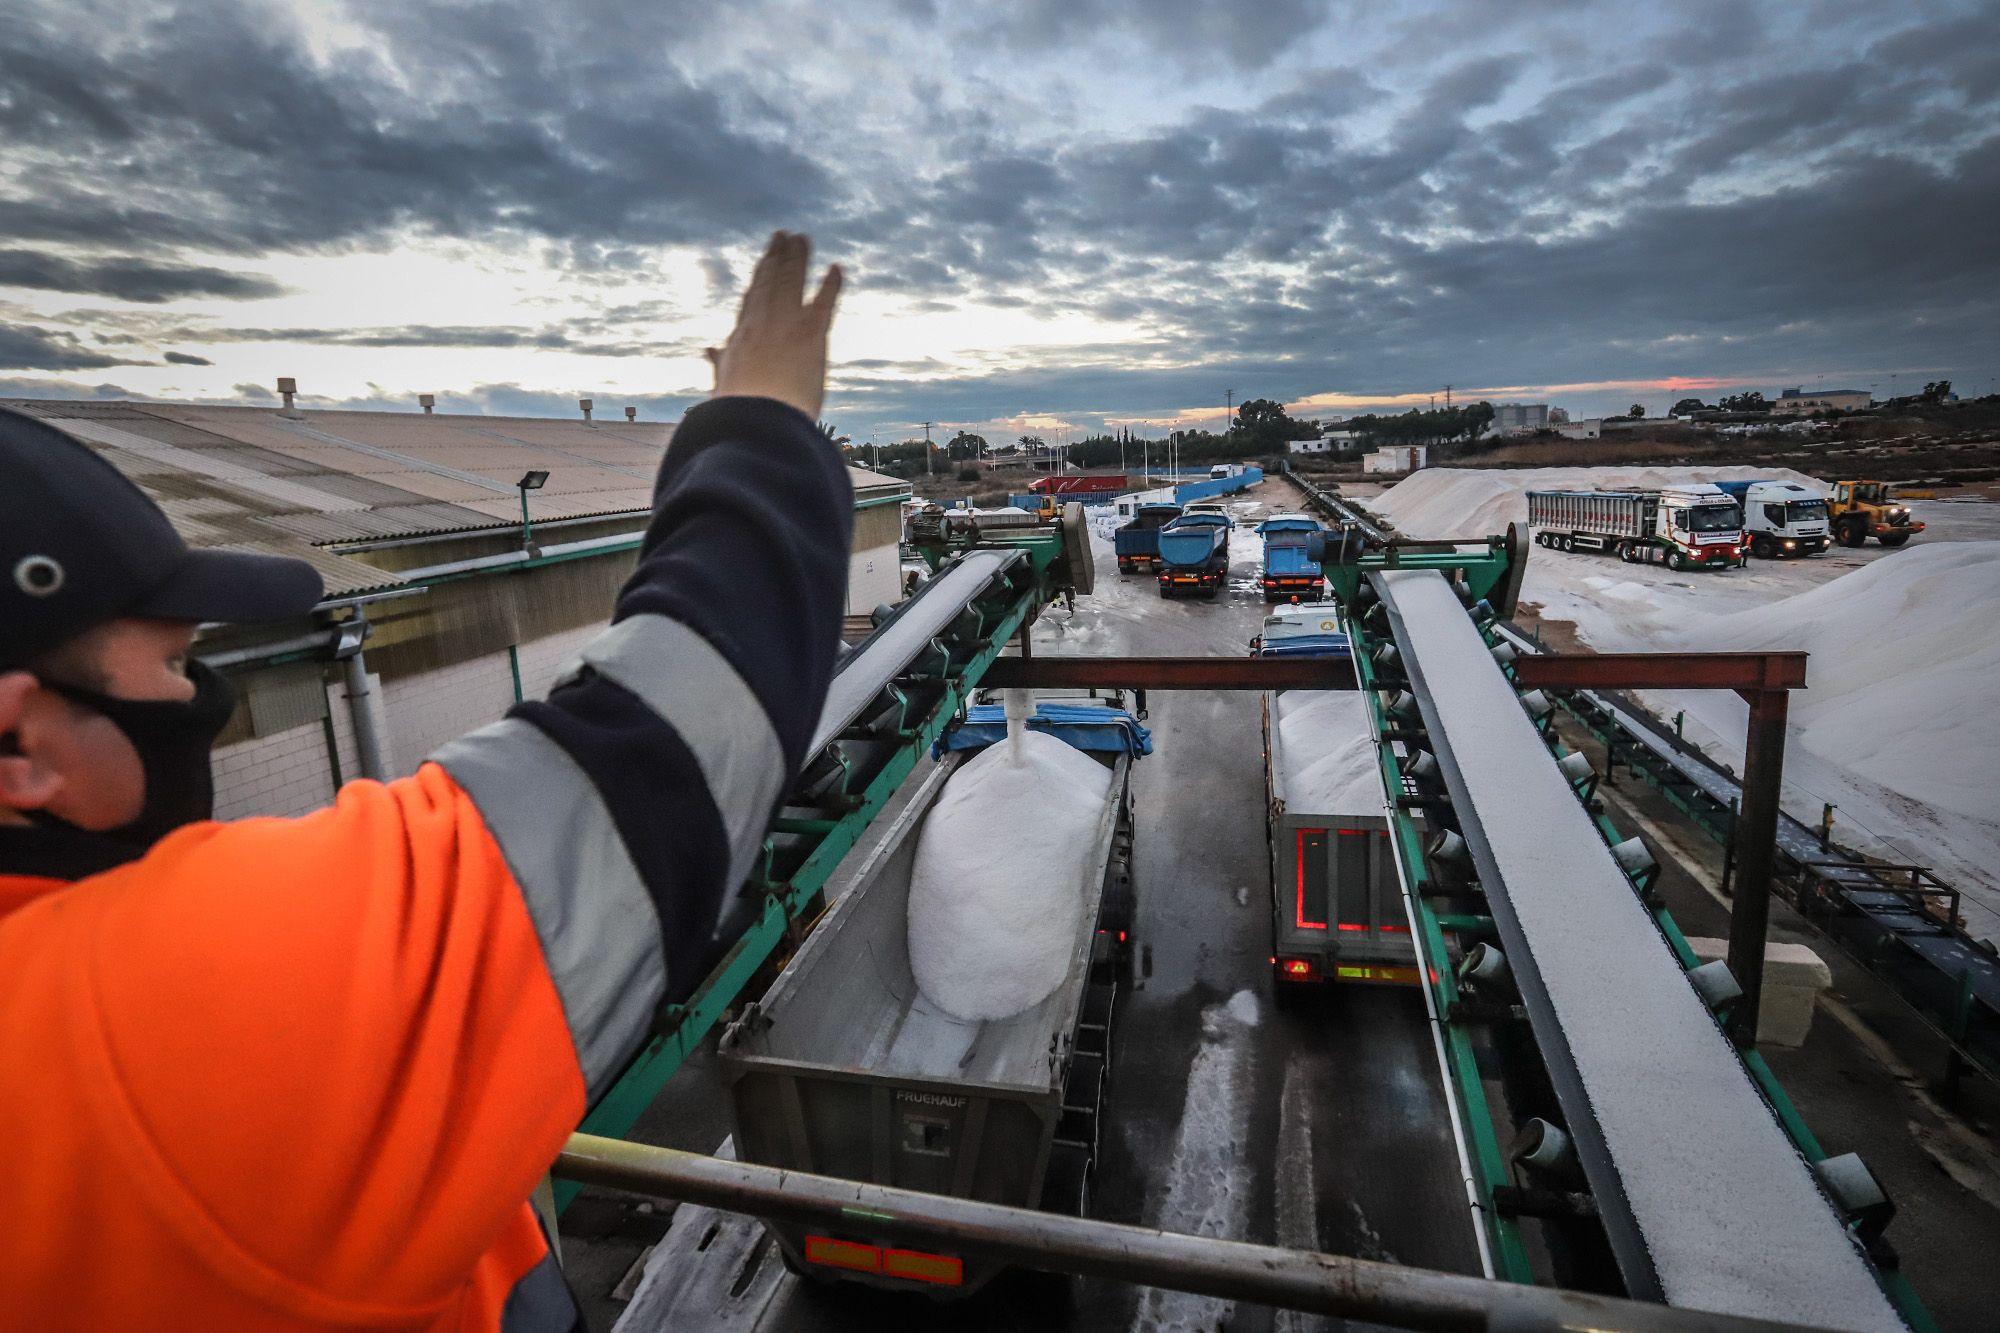 Carga de 3.500 toneladas de sal de las salinas de Torrevieja con destino a Madrid